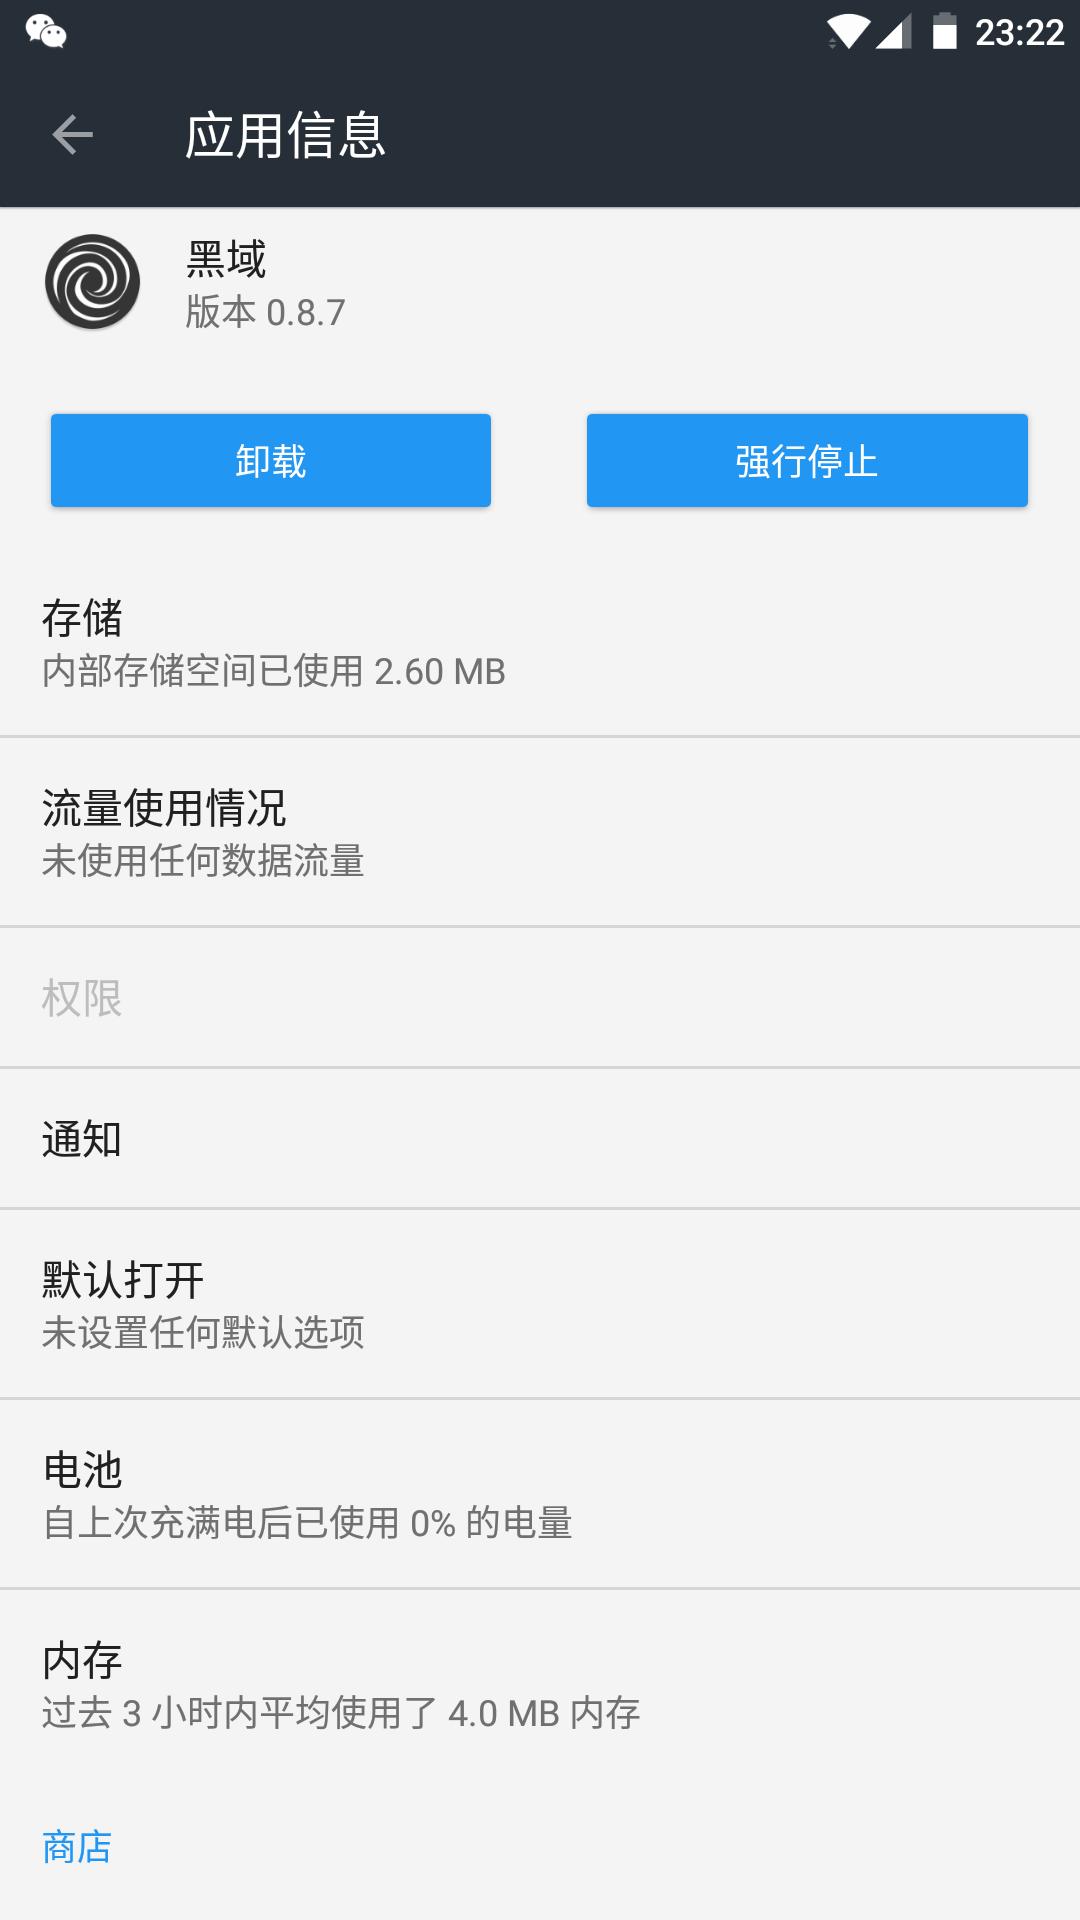 Screenshot_20170316-232252.png